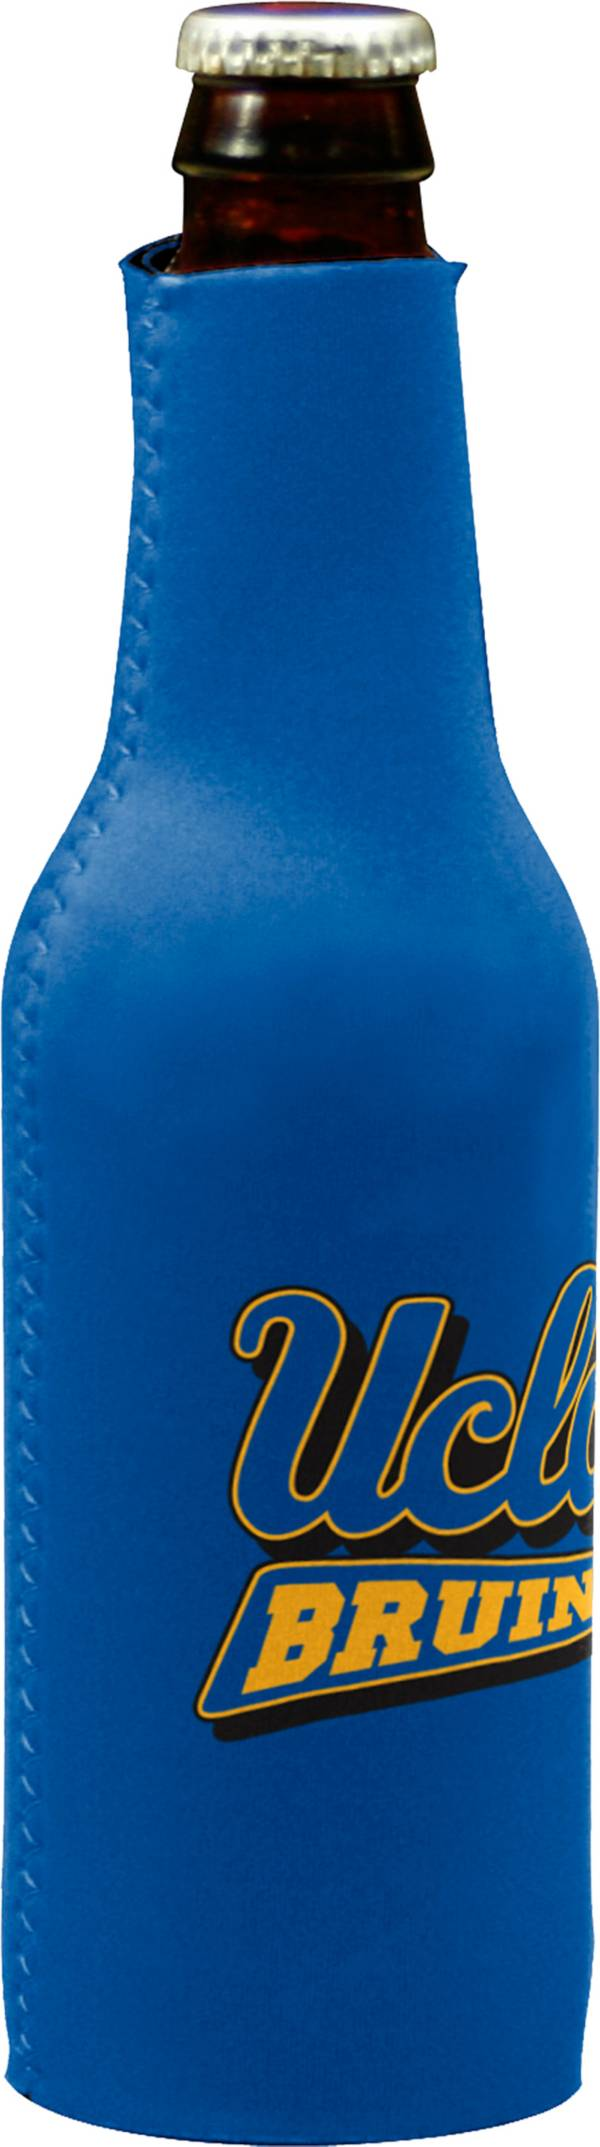 UCLA Bruins Bottle Koozie product image